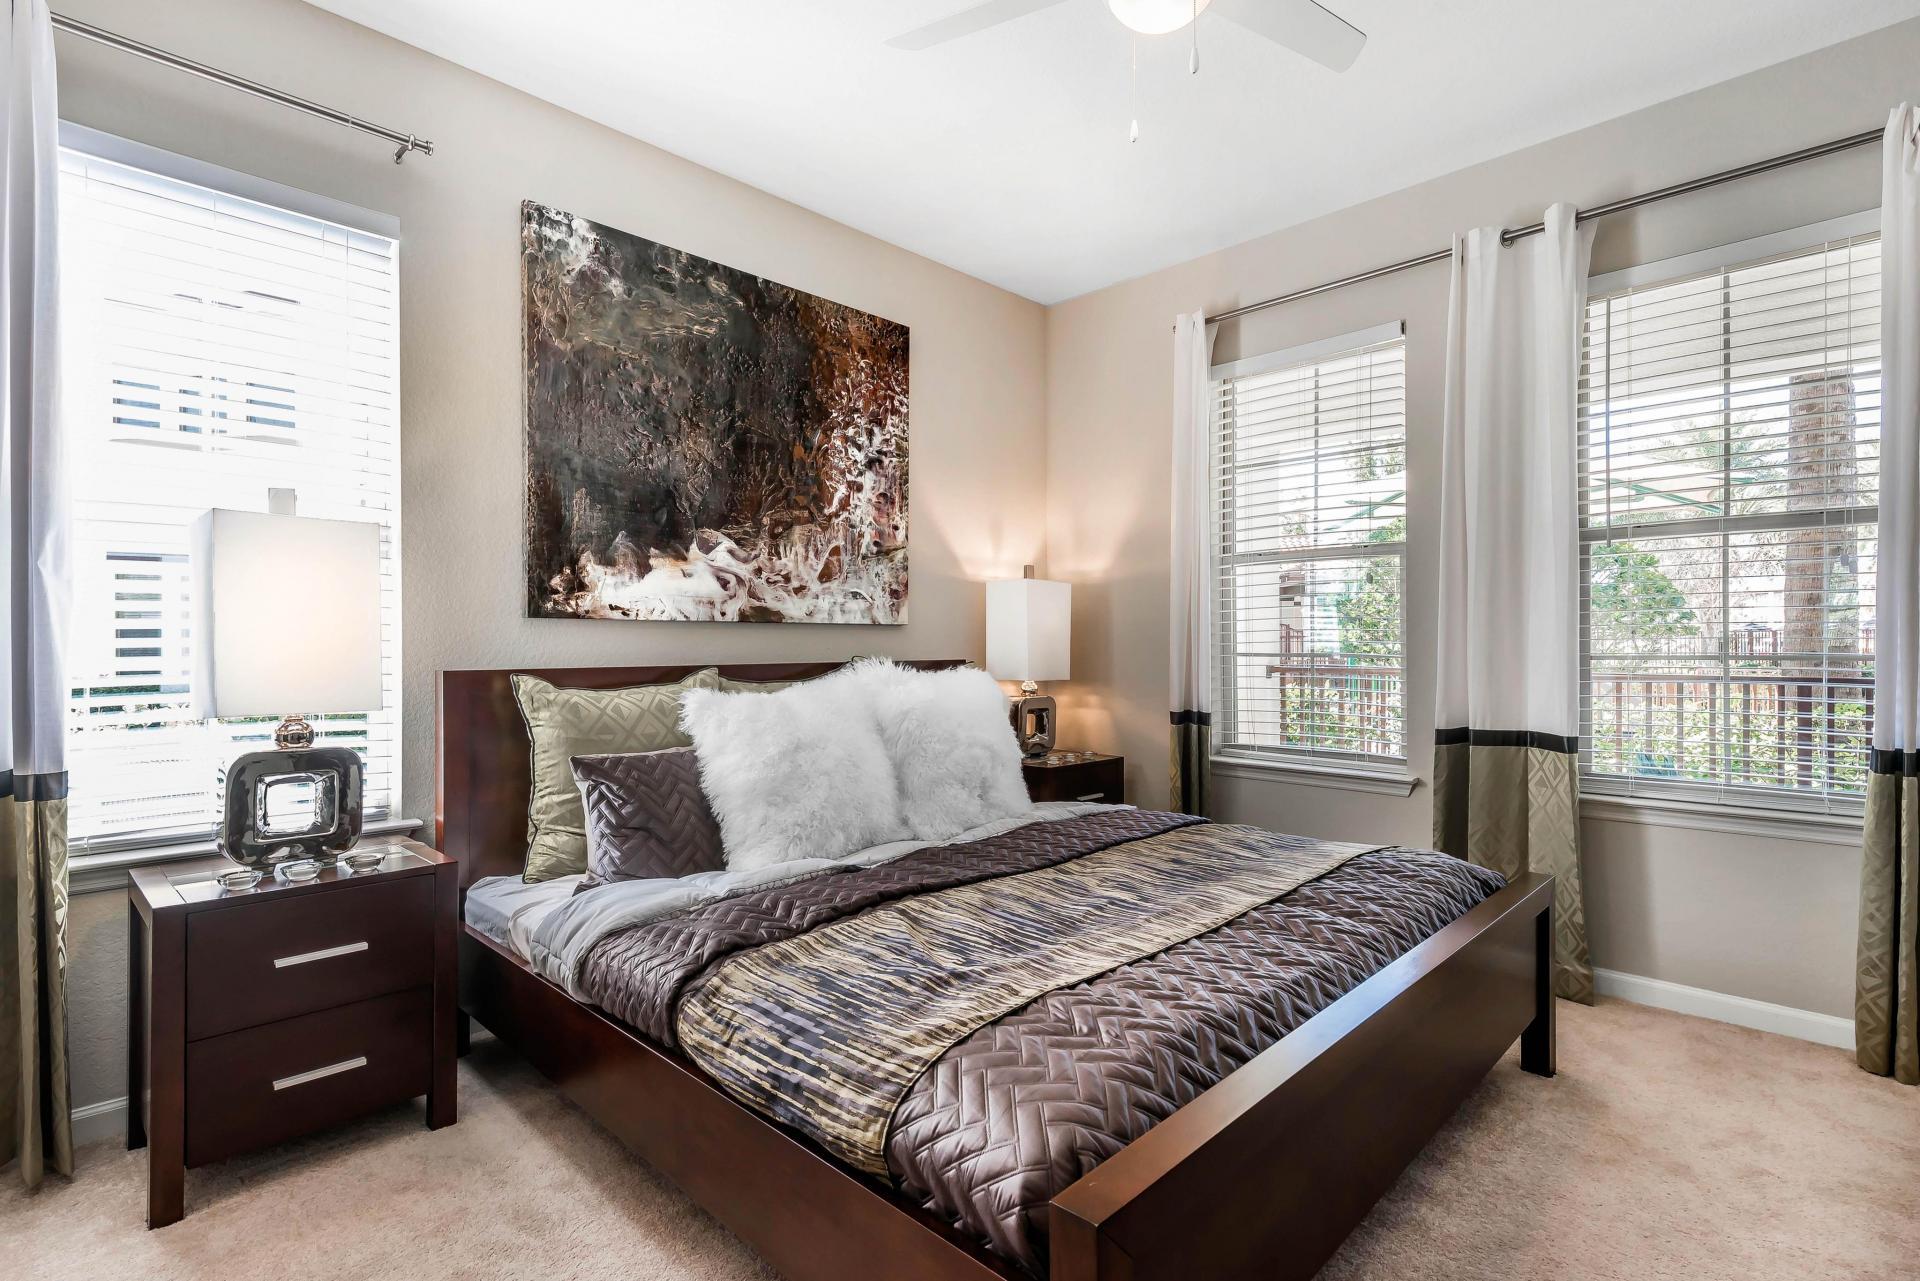 Bedroom at Citra Windermere Apartments